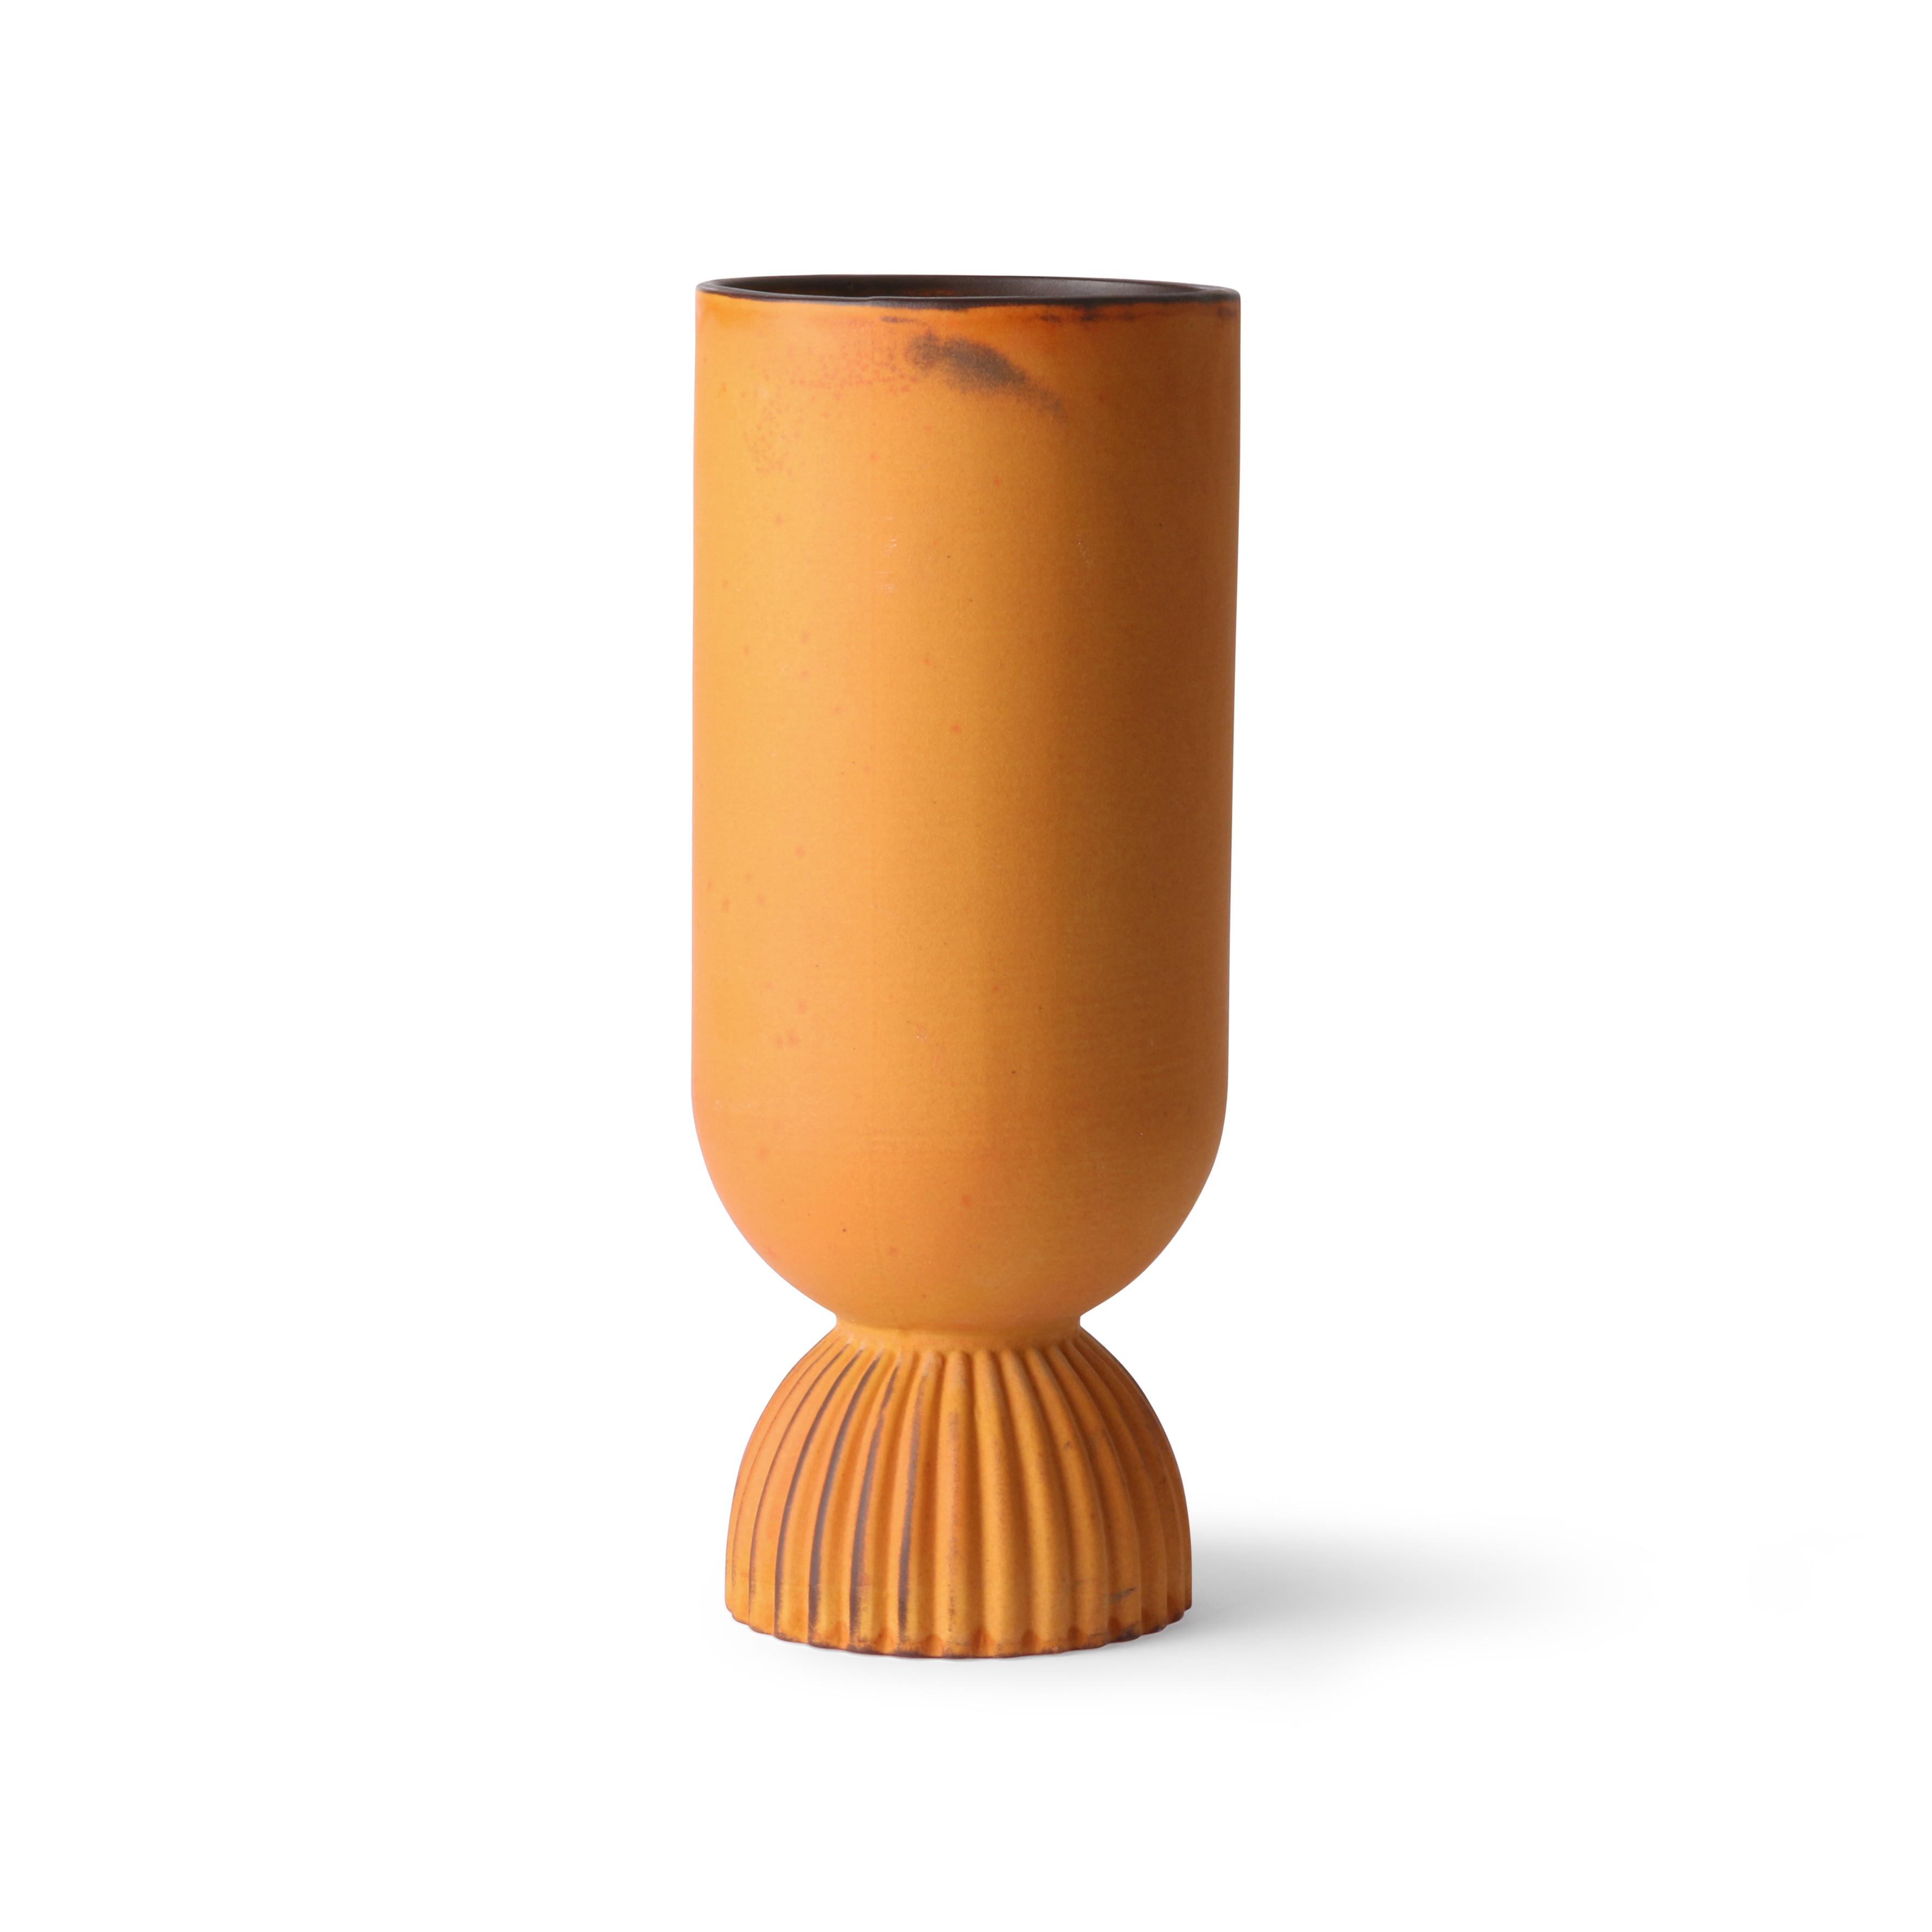 Ceramic flower vase ribbed base rustic